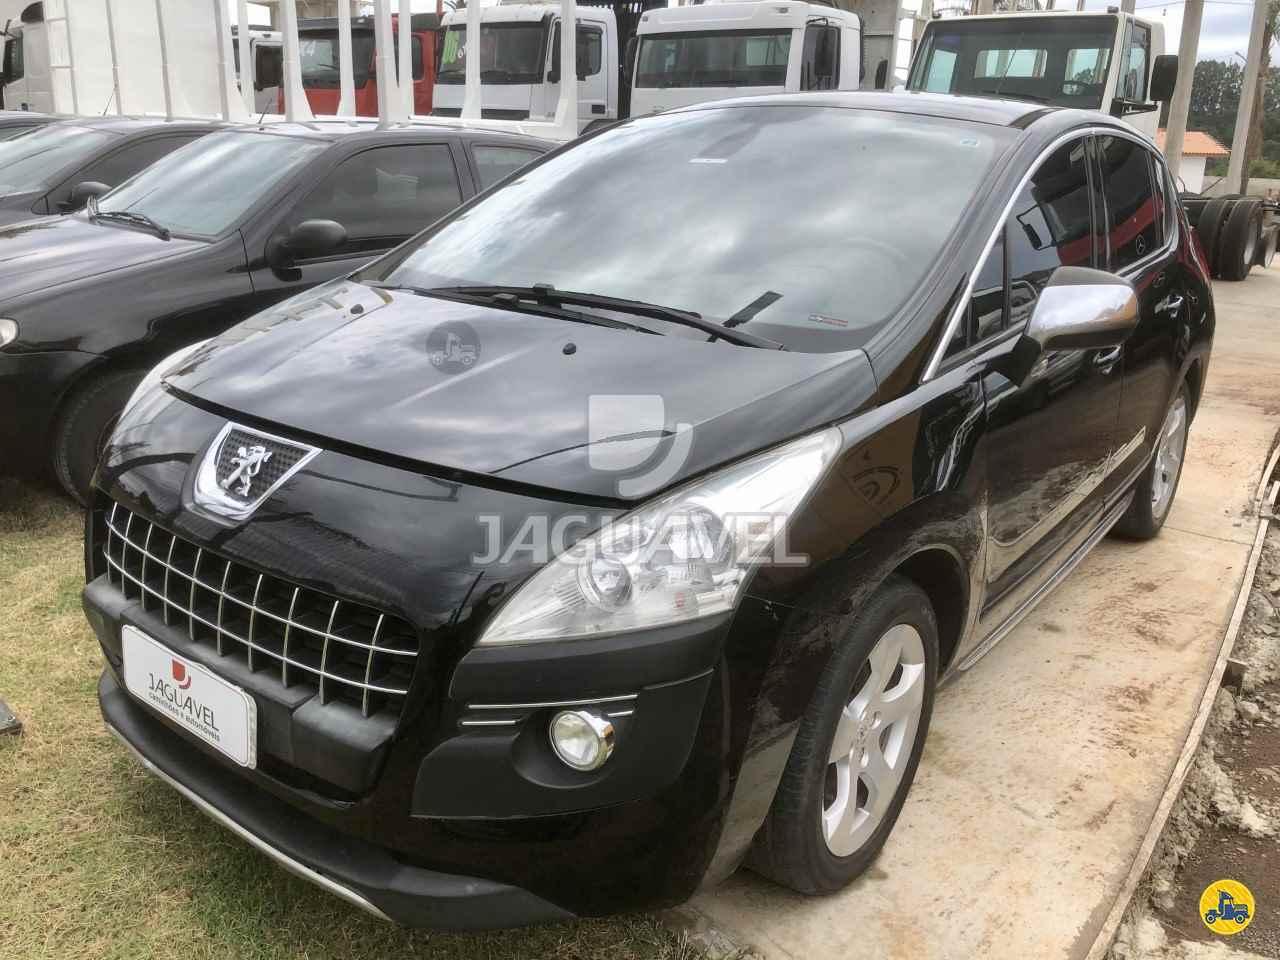 CARRO PEUGEOT 3008 1.6 Griffe Jaguavel Caminhões JAGUARIAIVA PARANÁ PR